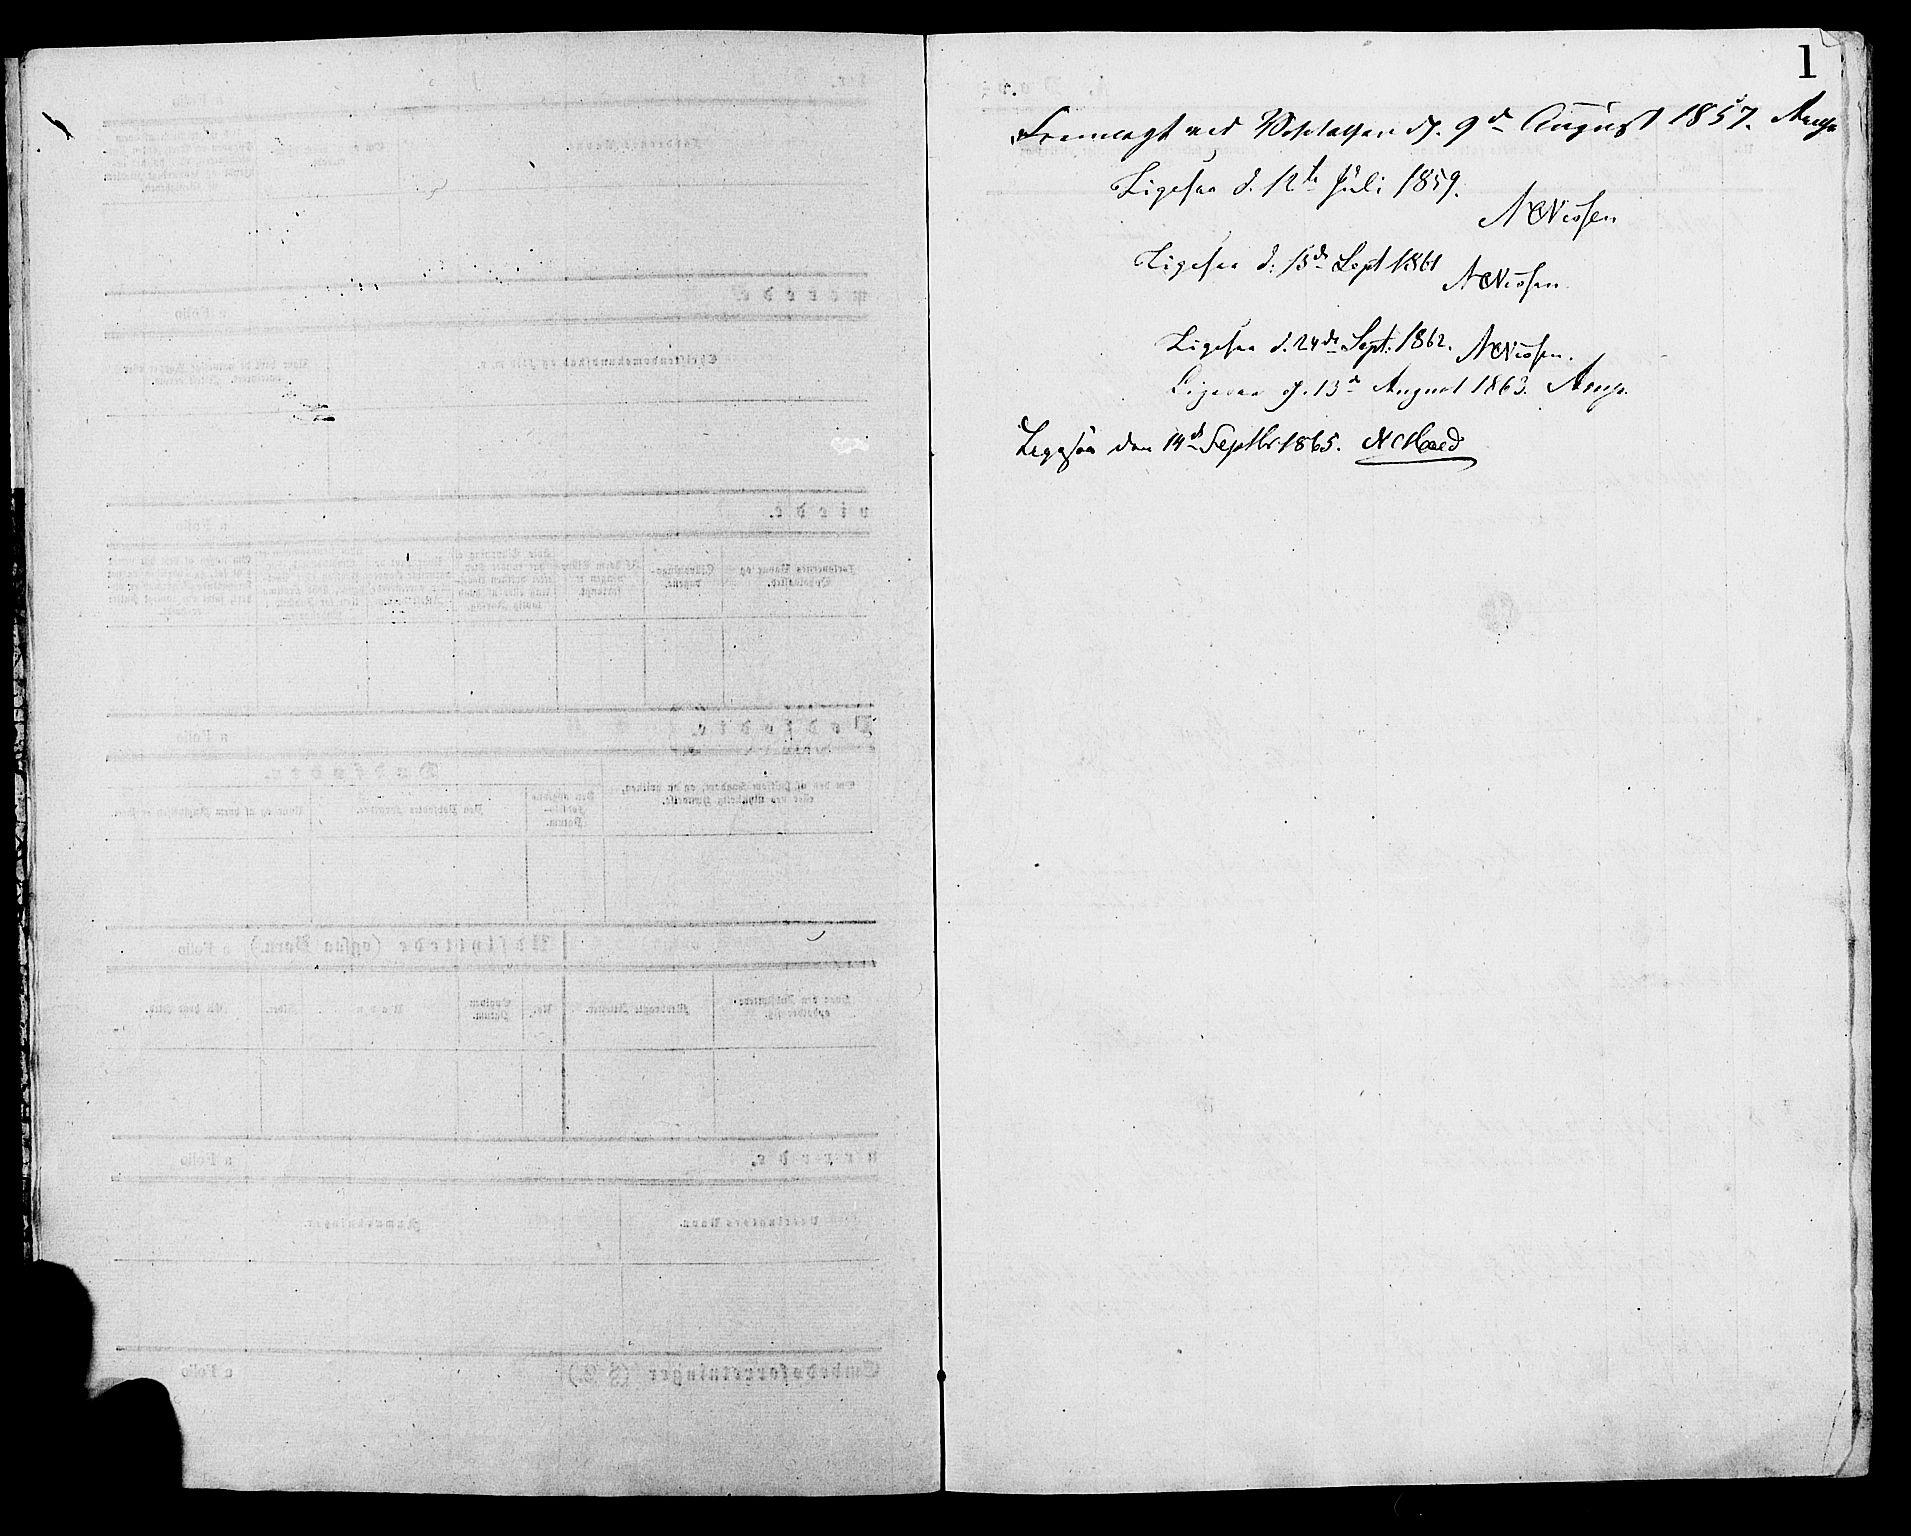 SAH, Lesja prestekontor, Parish register (official) no. 9, 1854-1889, p. 1